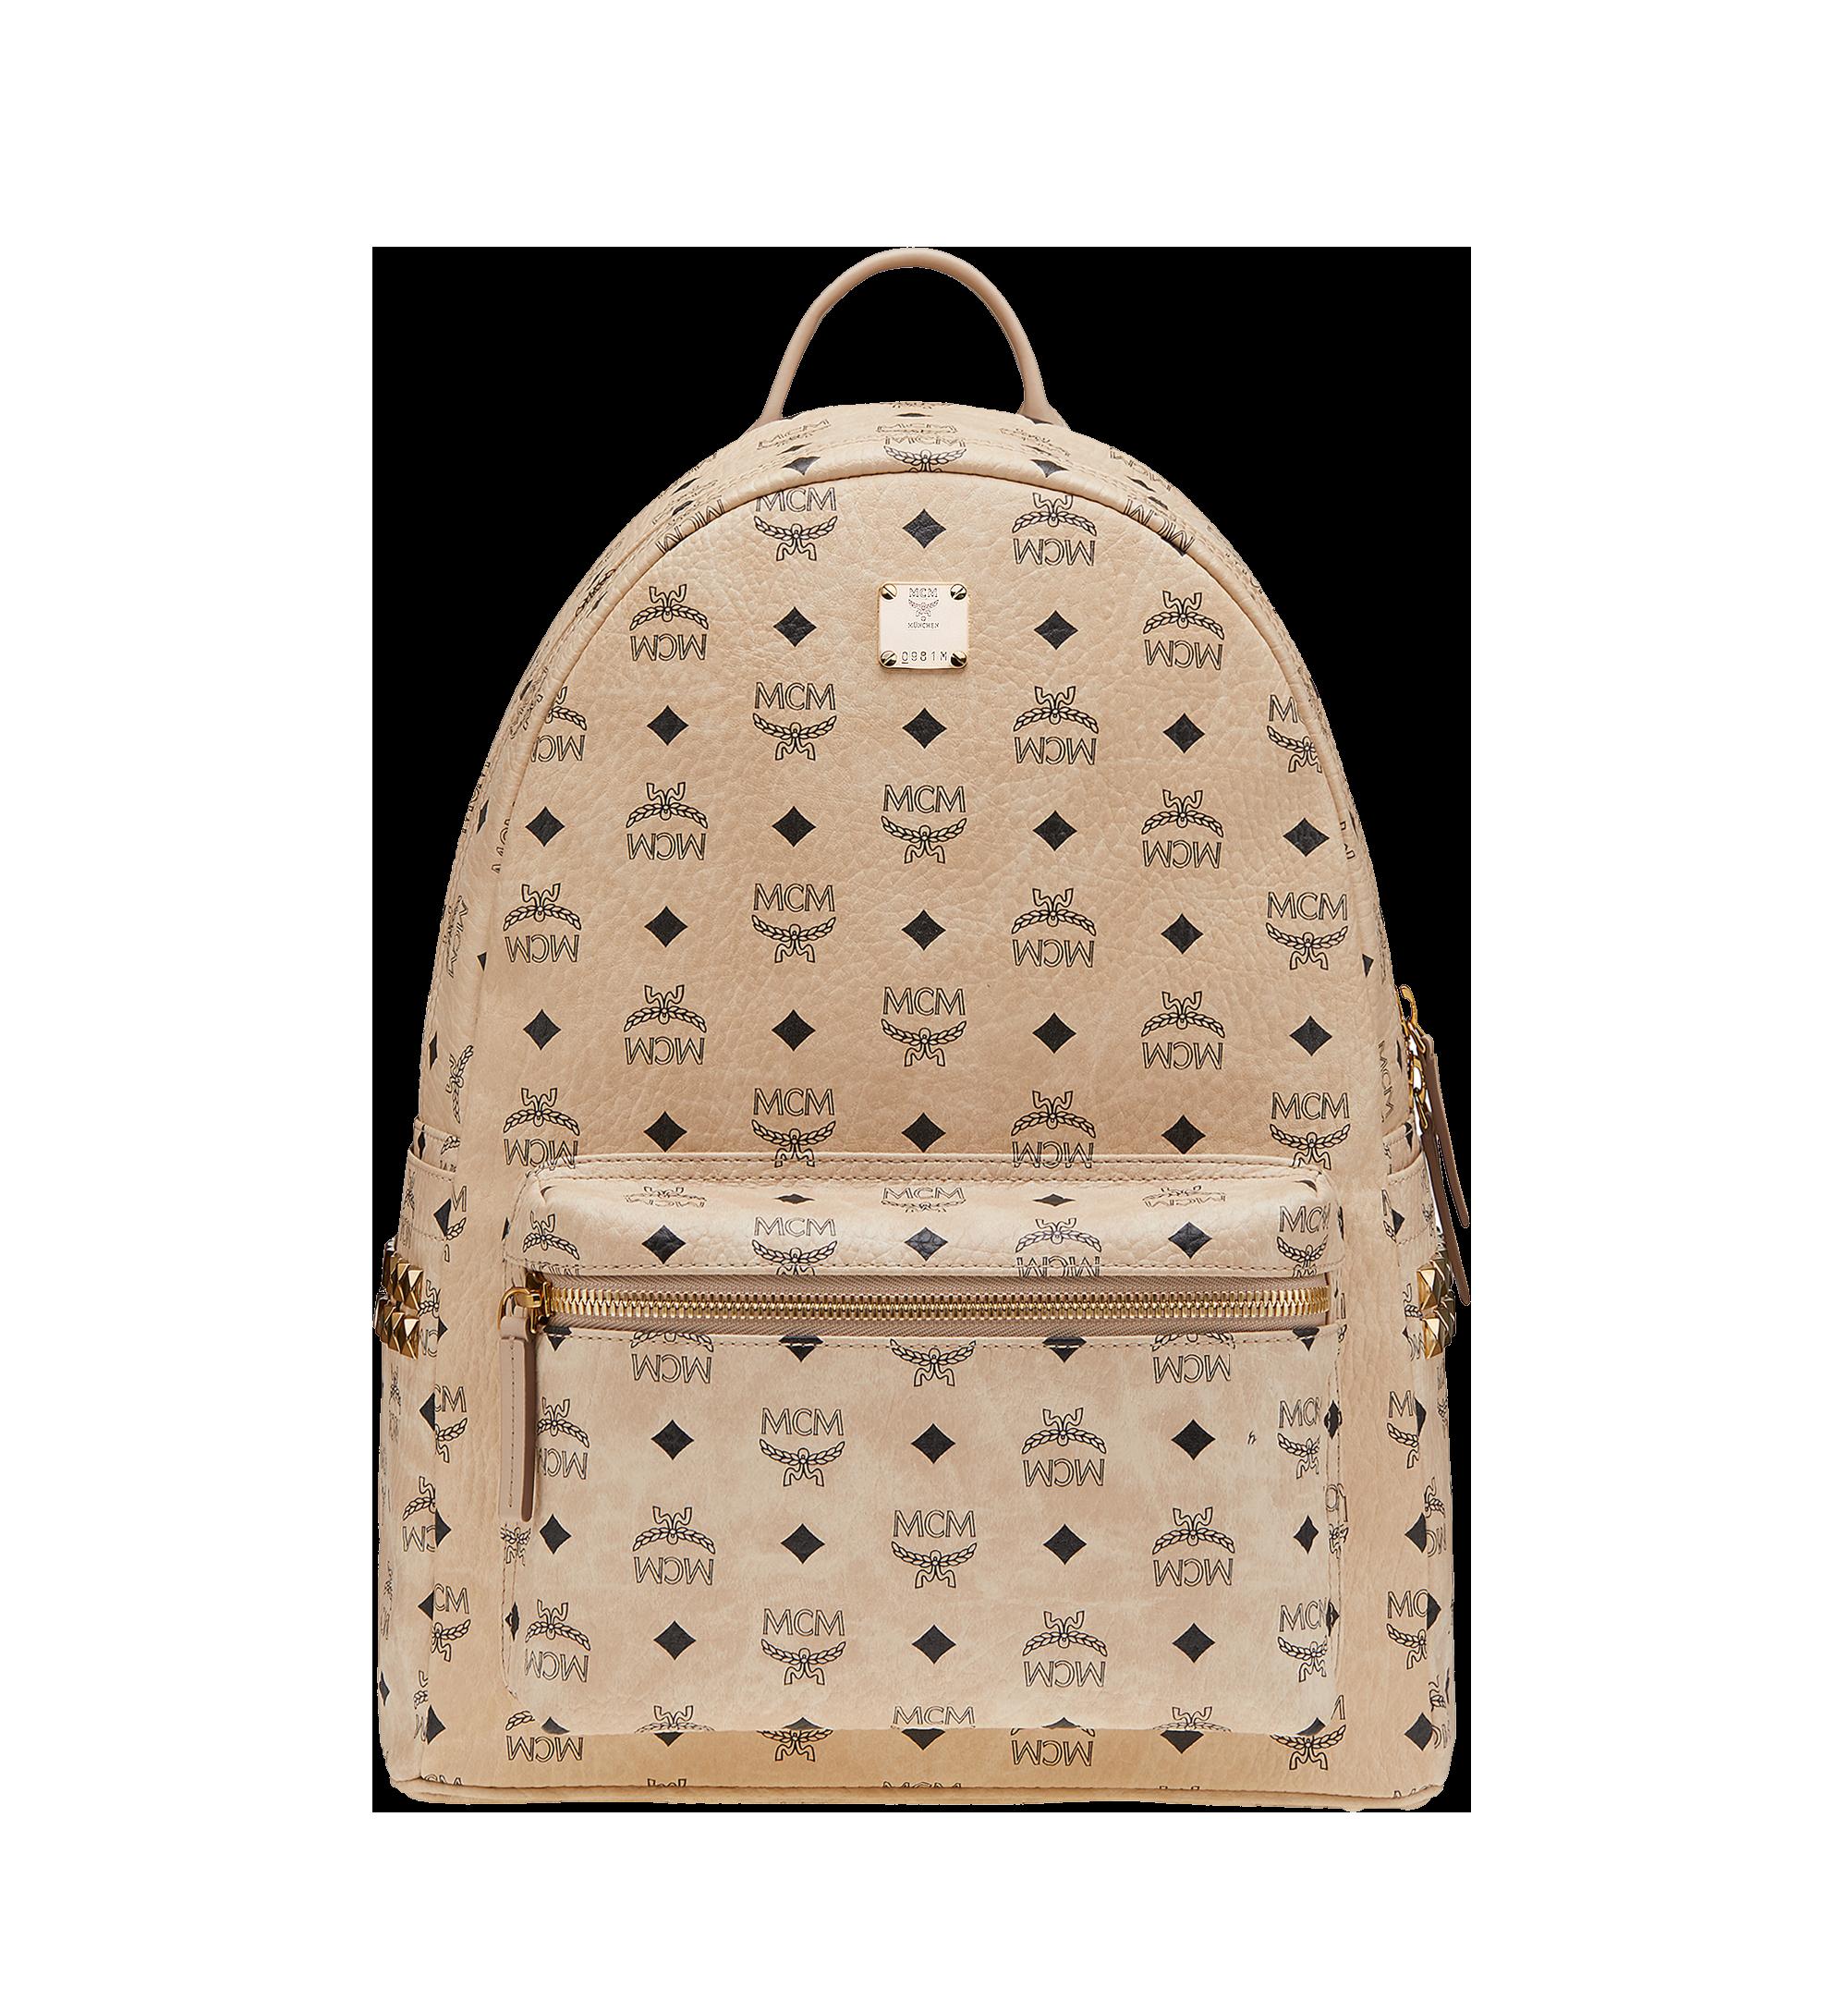 40 cm 16 in Stark Side Studs Backpack in Visetos Beige